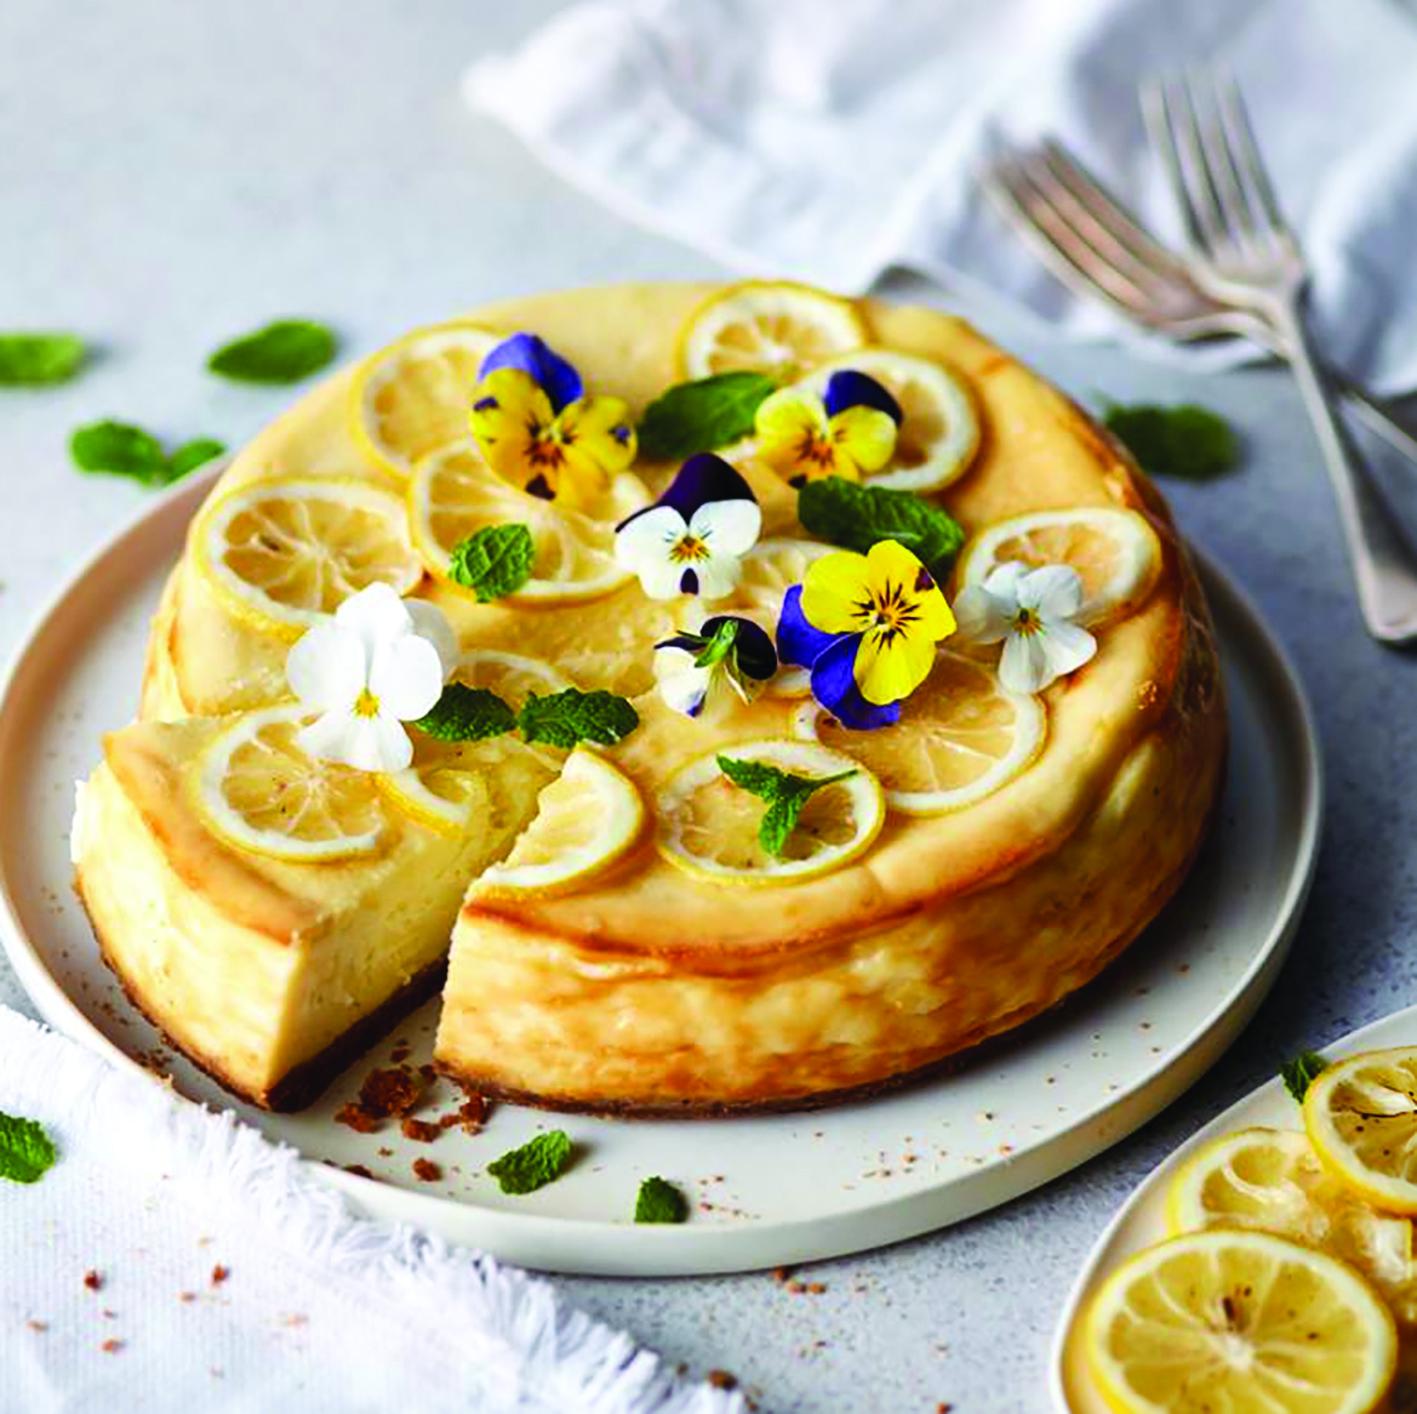 Ultimate baked lemon cheesecake recipe